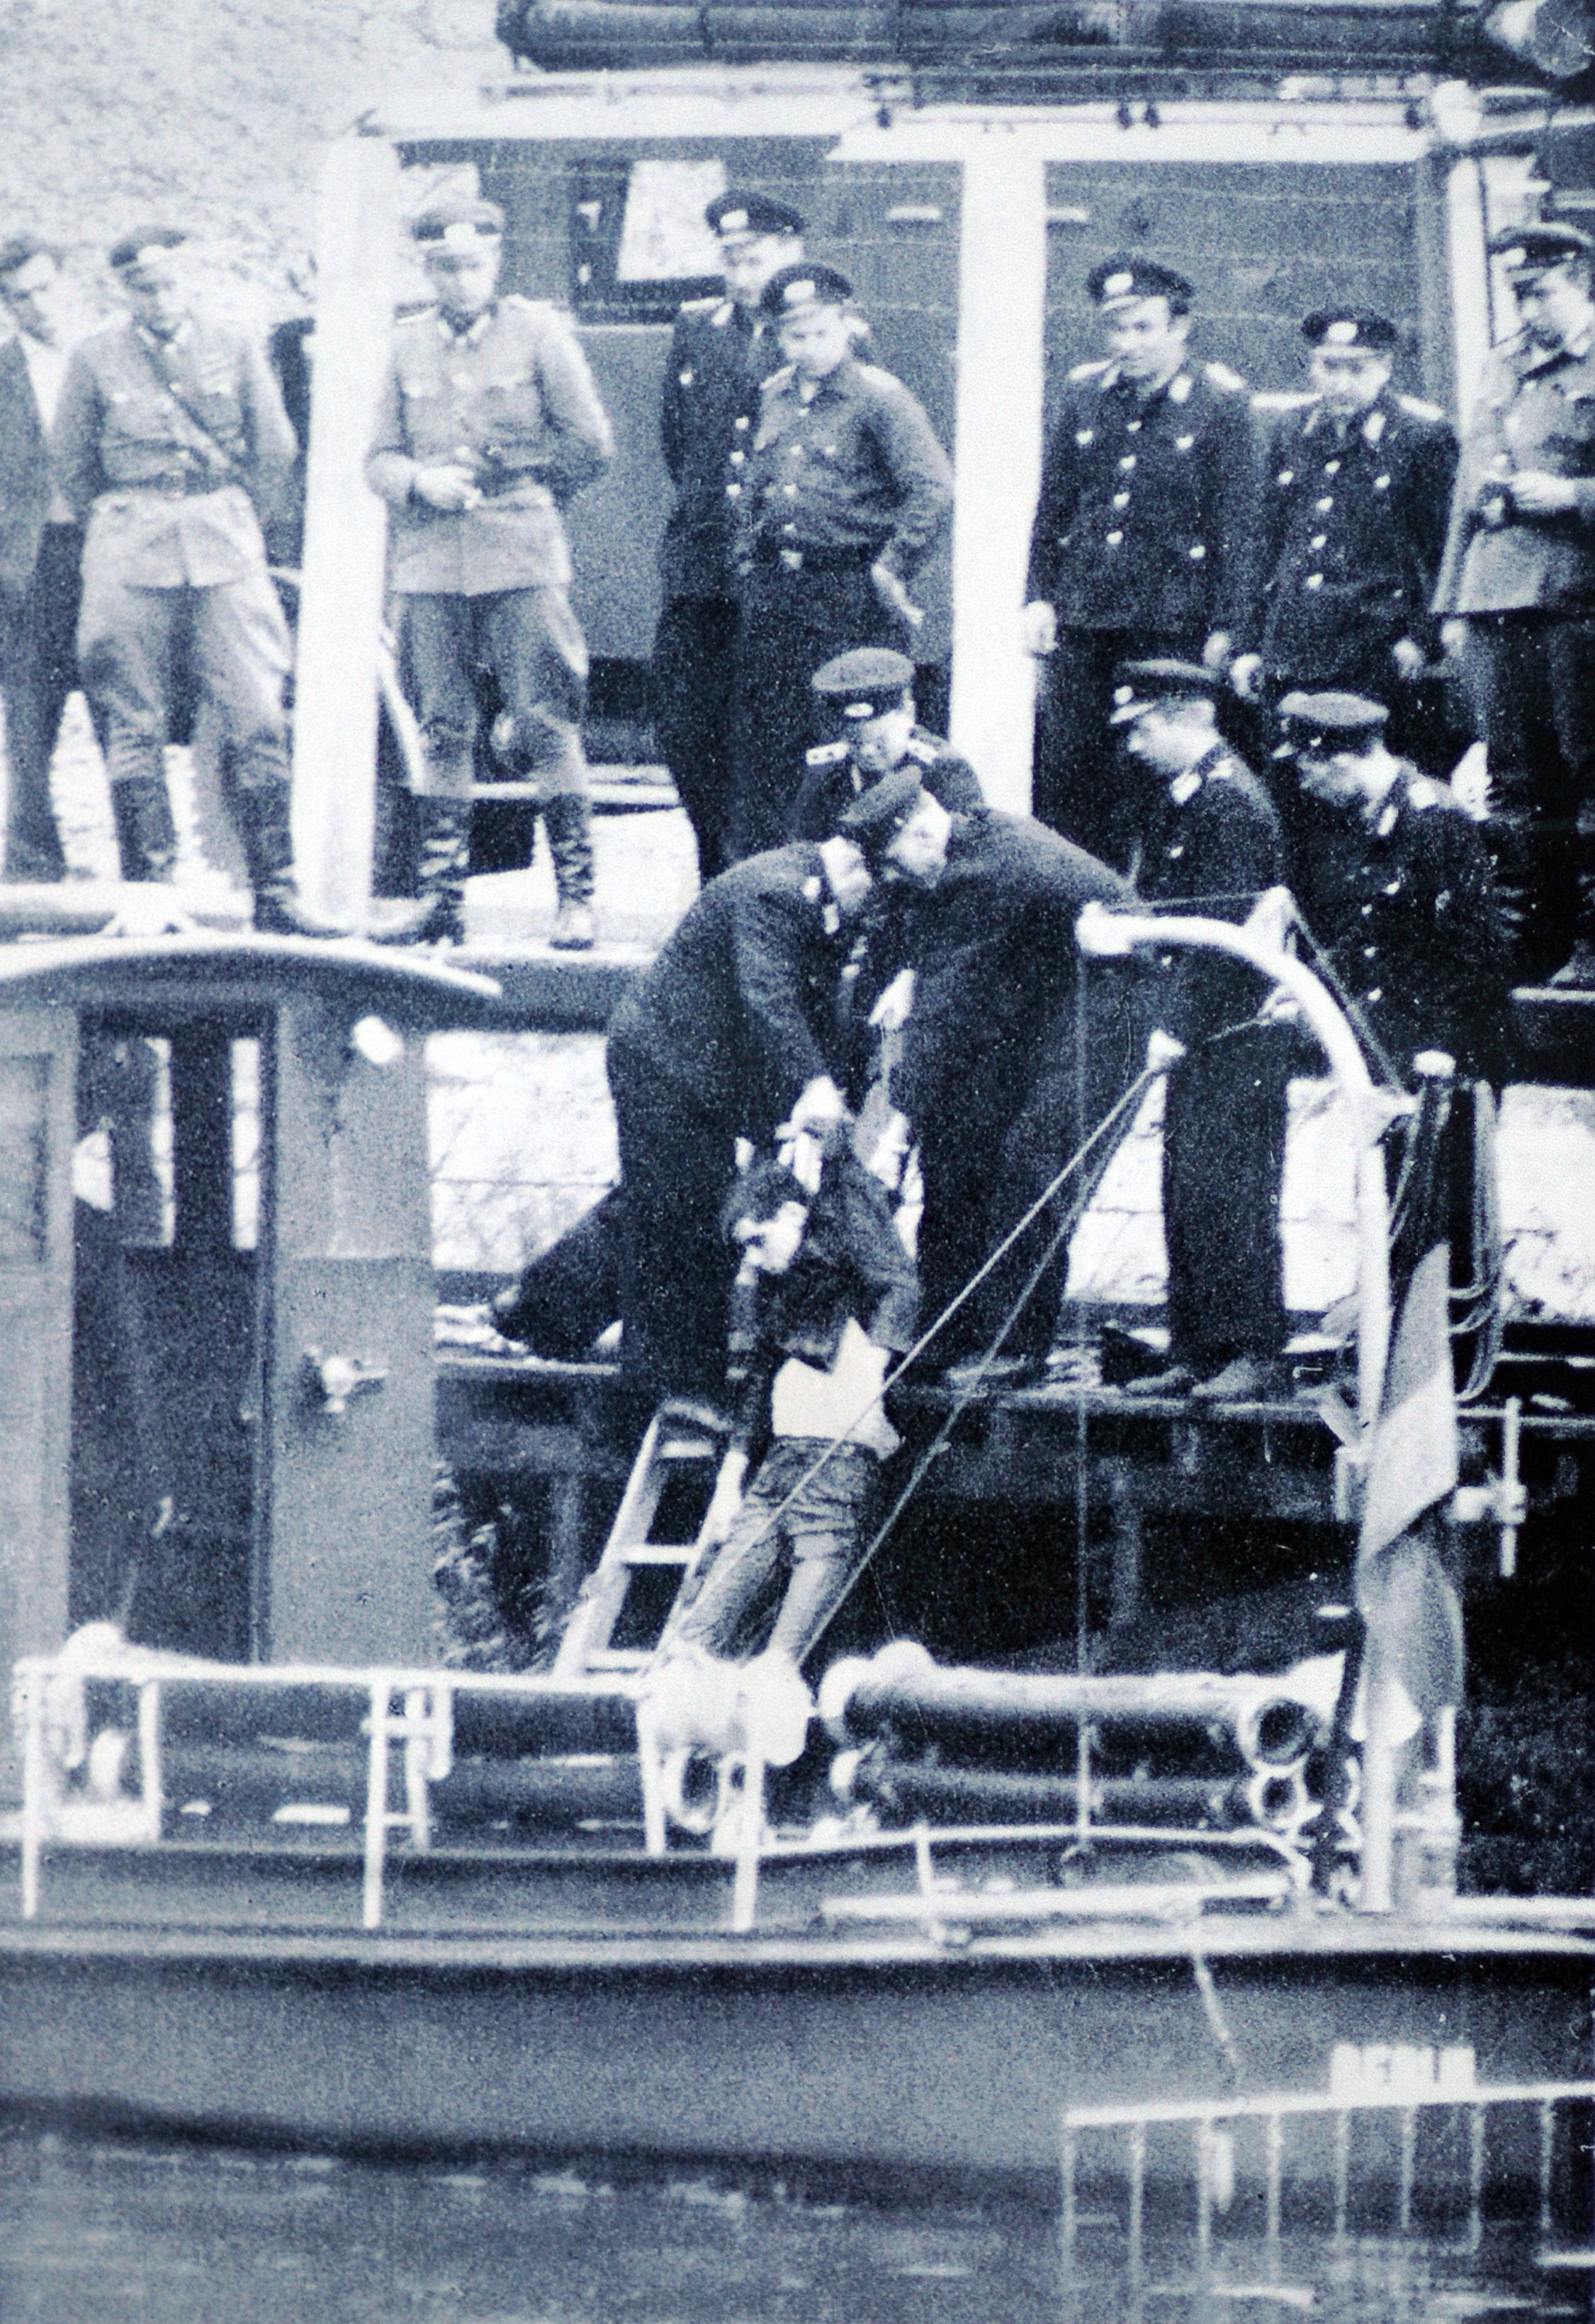 1961. aug 24. Bergung des erschossenen G+-nter Litfin aus dem Becken des Humboldthafens2.jpg